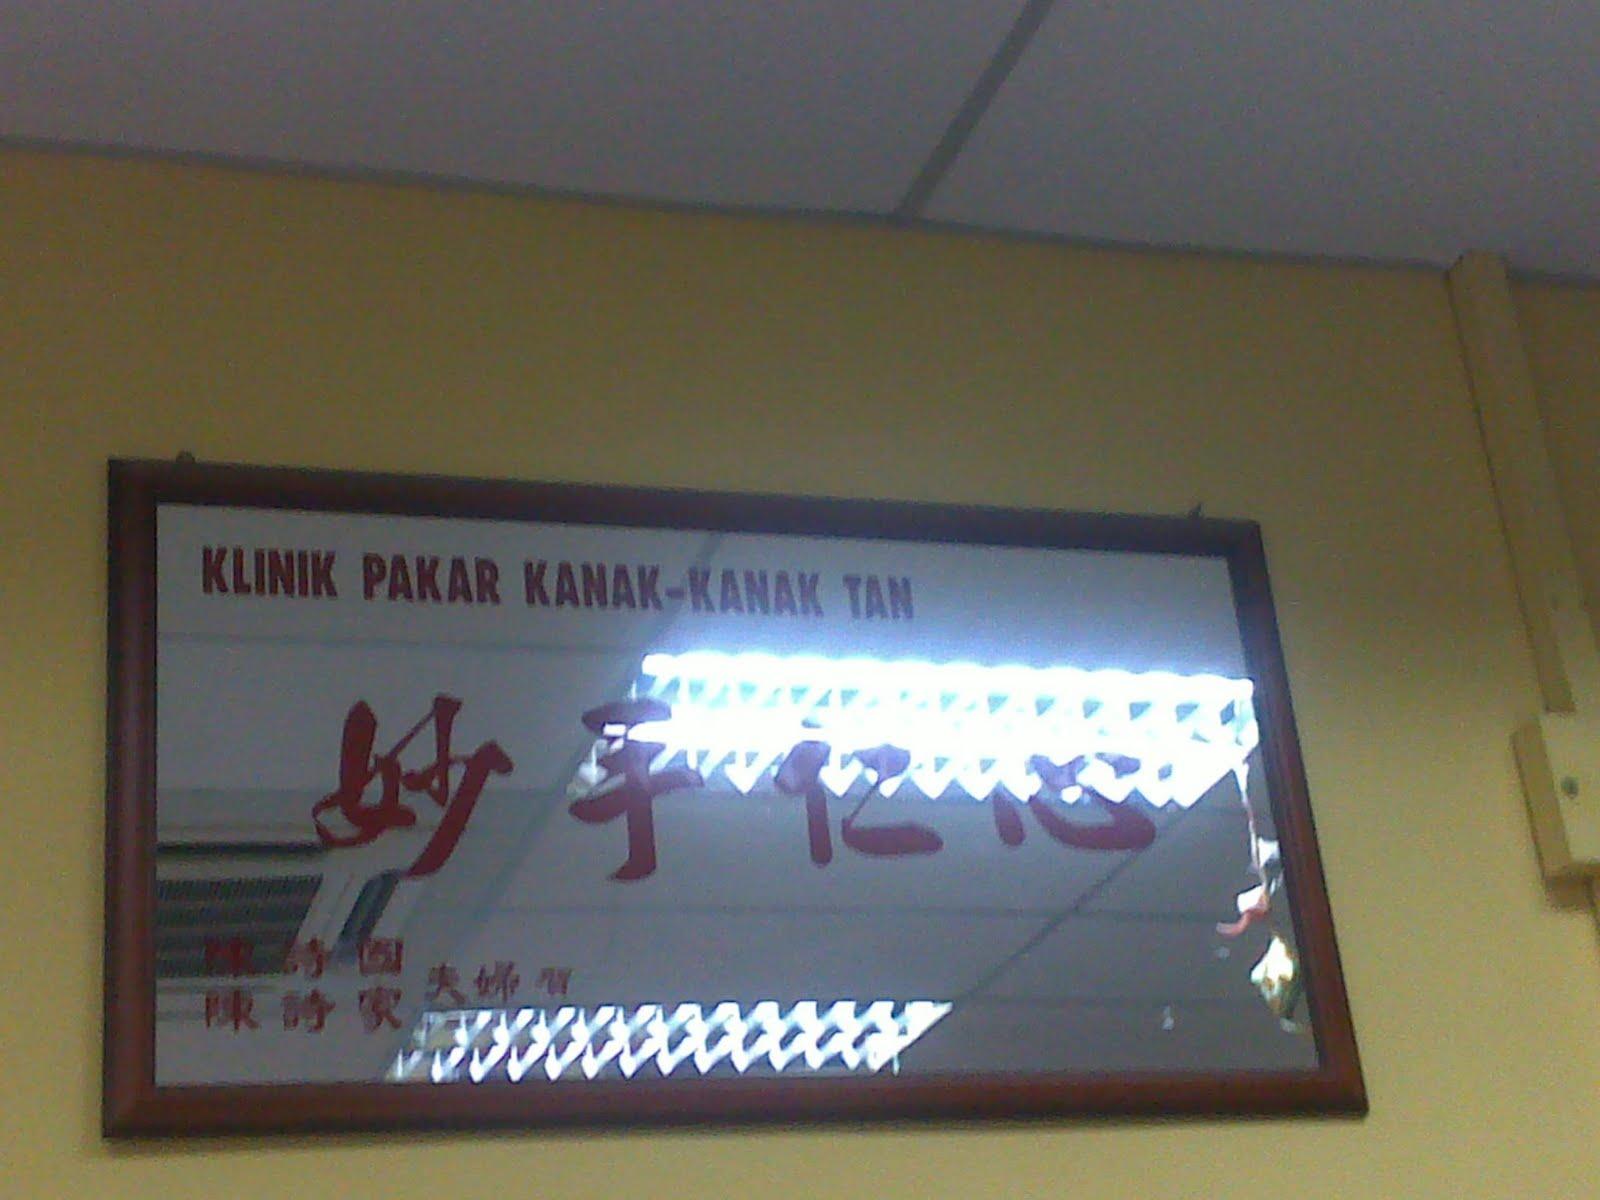 Klinik Pakar Kanak Kanak Tan Kuala Lumpur Federal Territory Of Kuala Lumpur Malaysia Find A Clinic With Getdoc